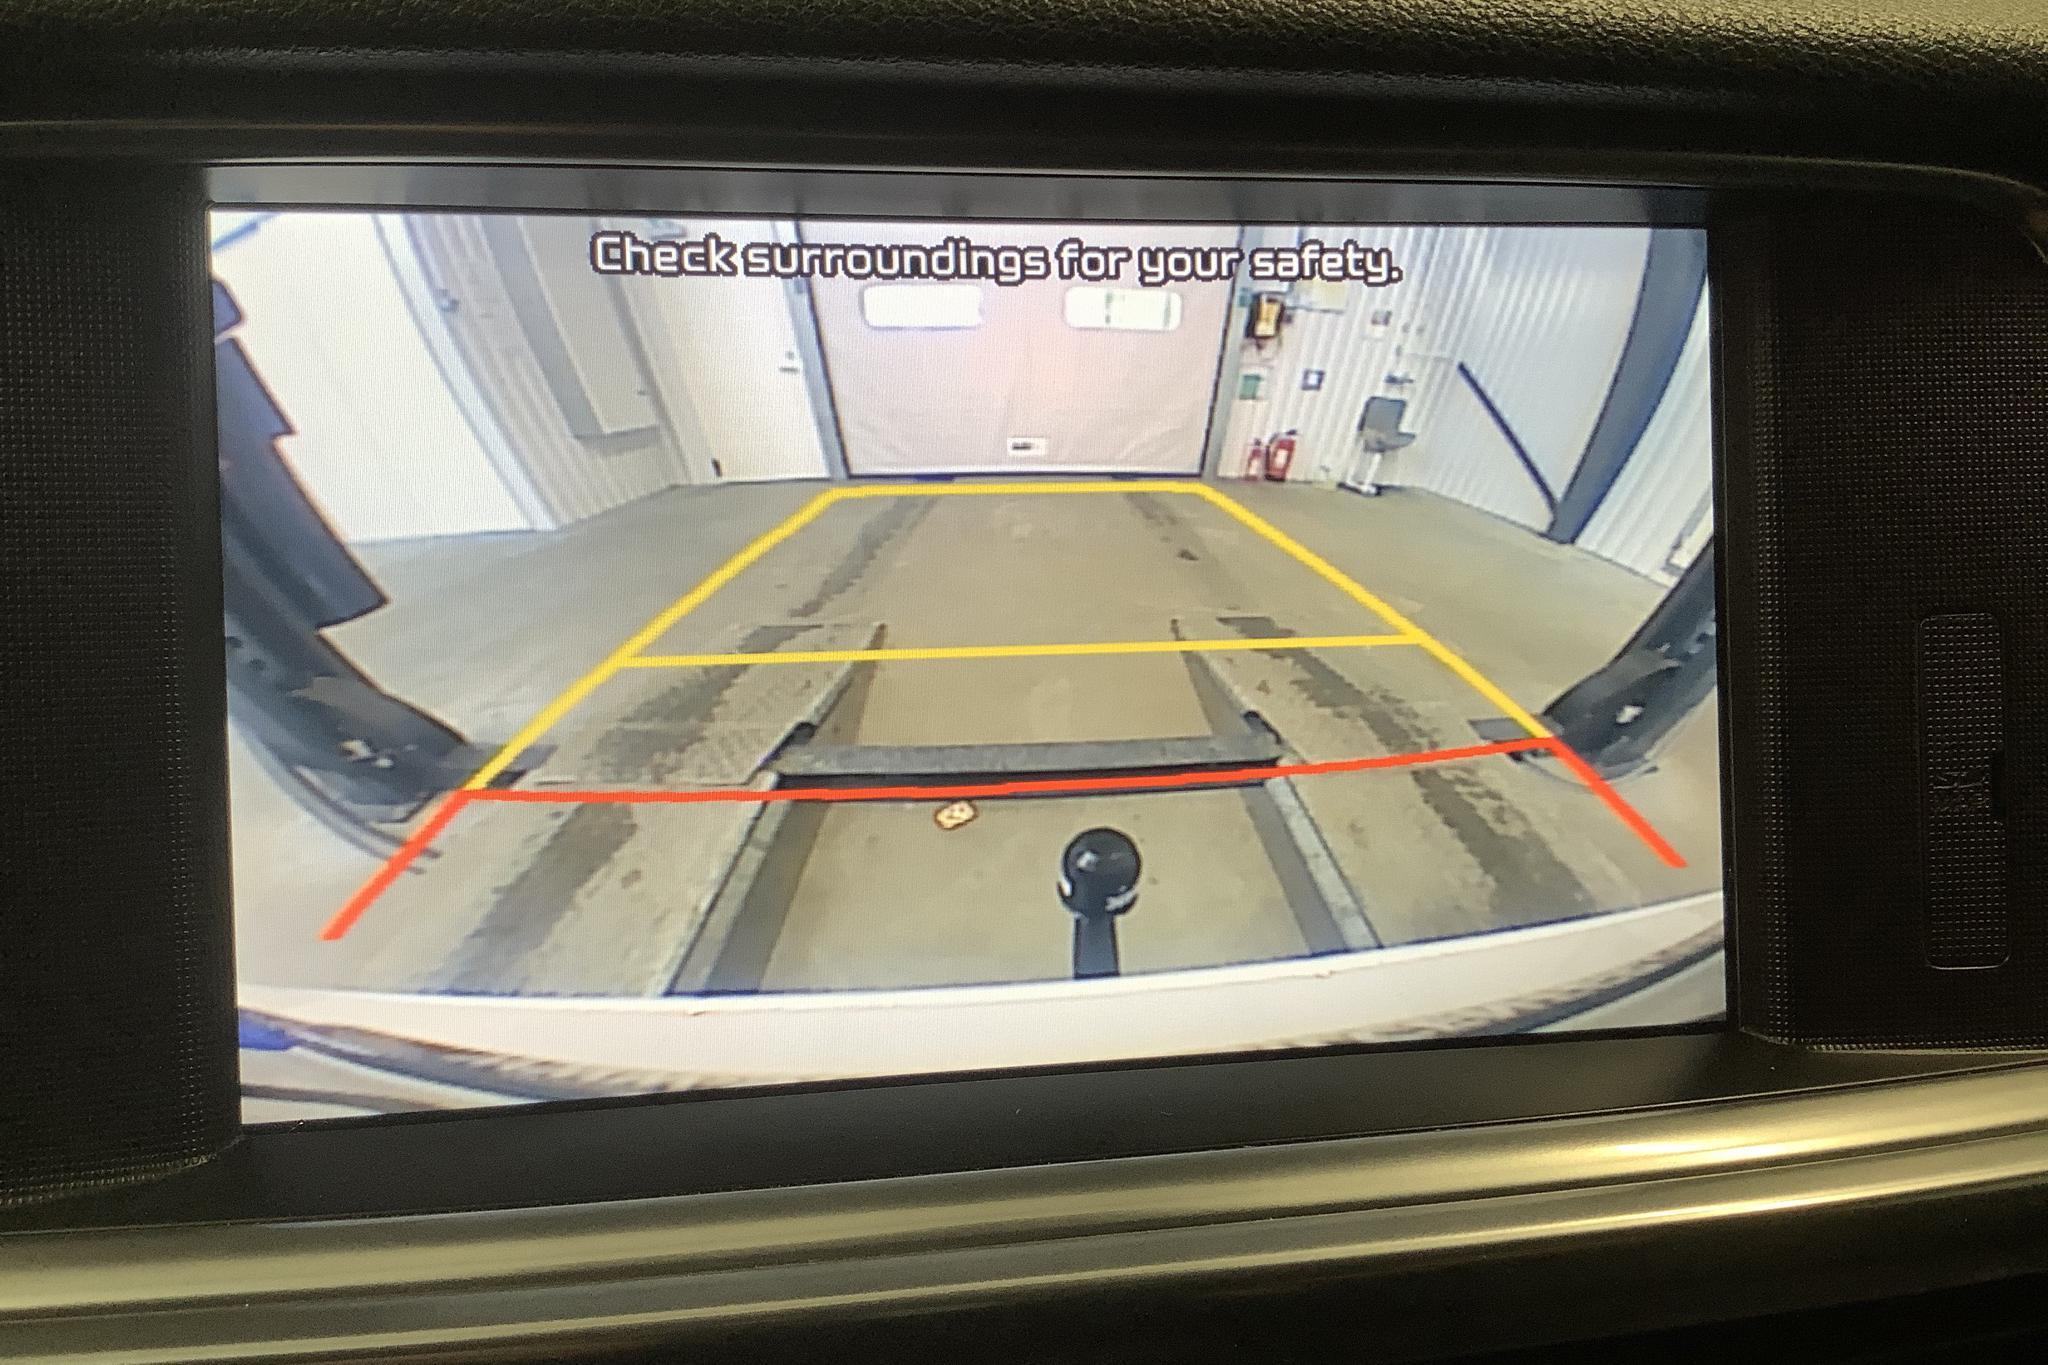 KIA Optima 1.7 CRDi SW (141hk) - 86 890 km - Automatic - white - 2017